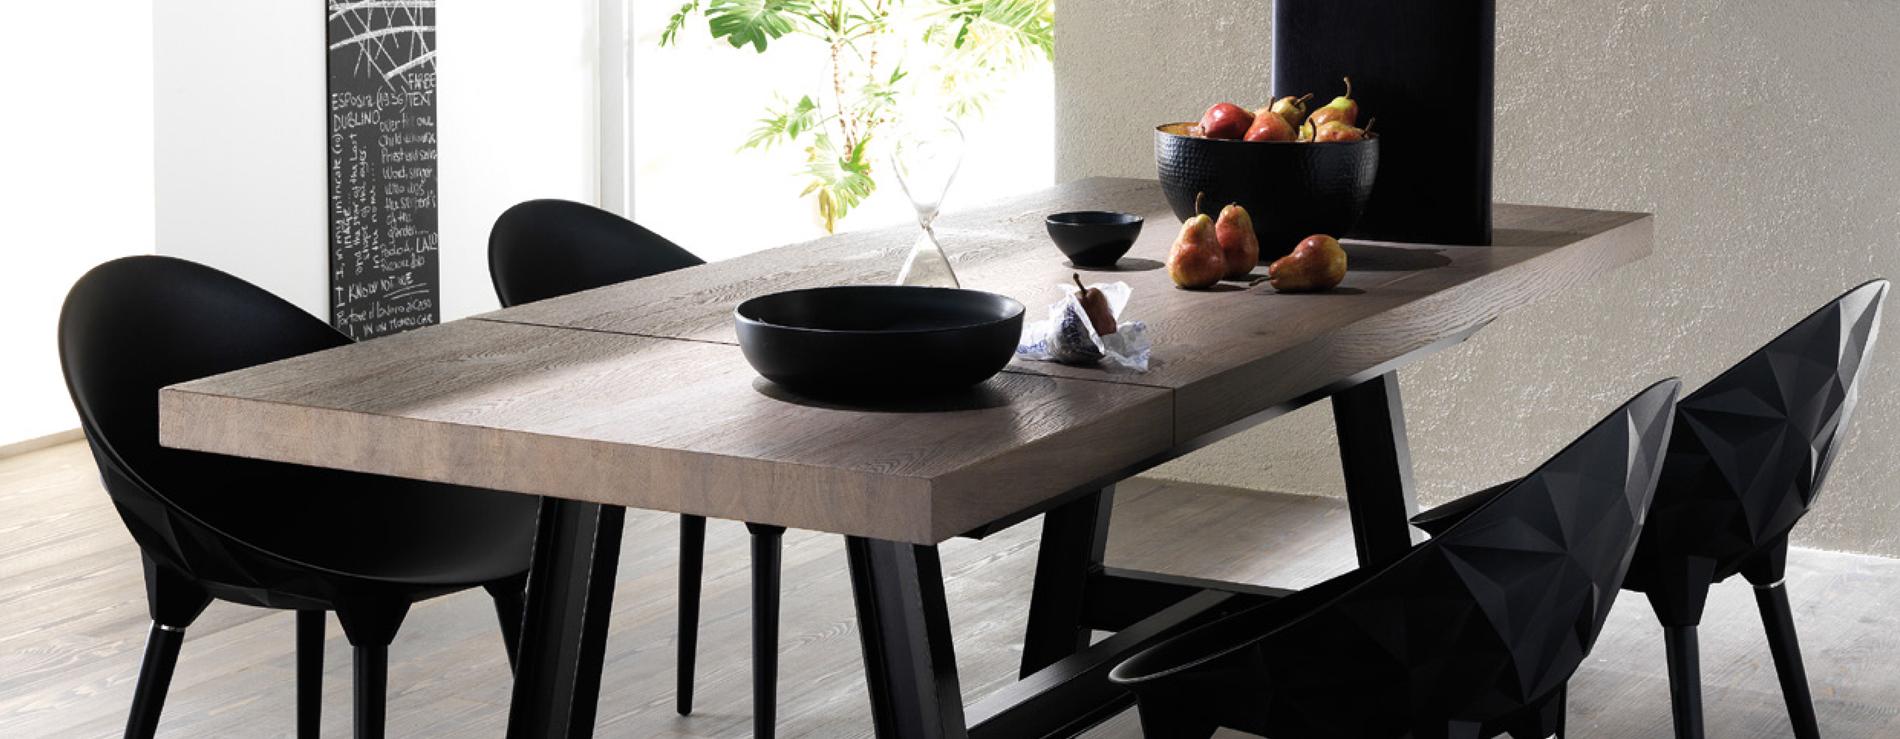 Misfit Table - Tavolo - Scavolini - Centro Mobili